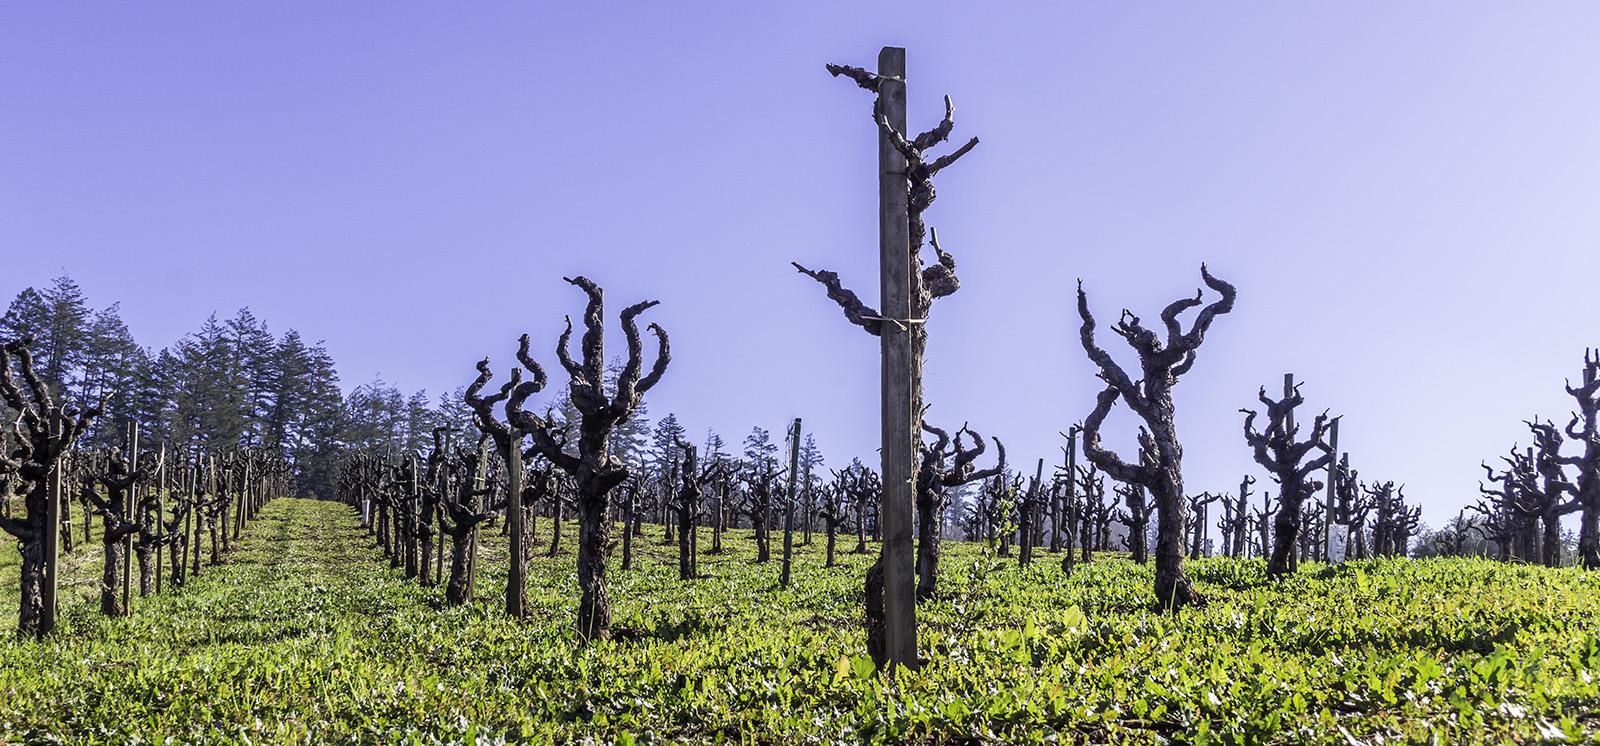 One of many vineyards along Dry Creek Road, in Healdsberg, CA, January 2015